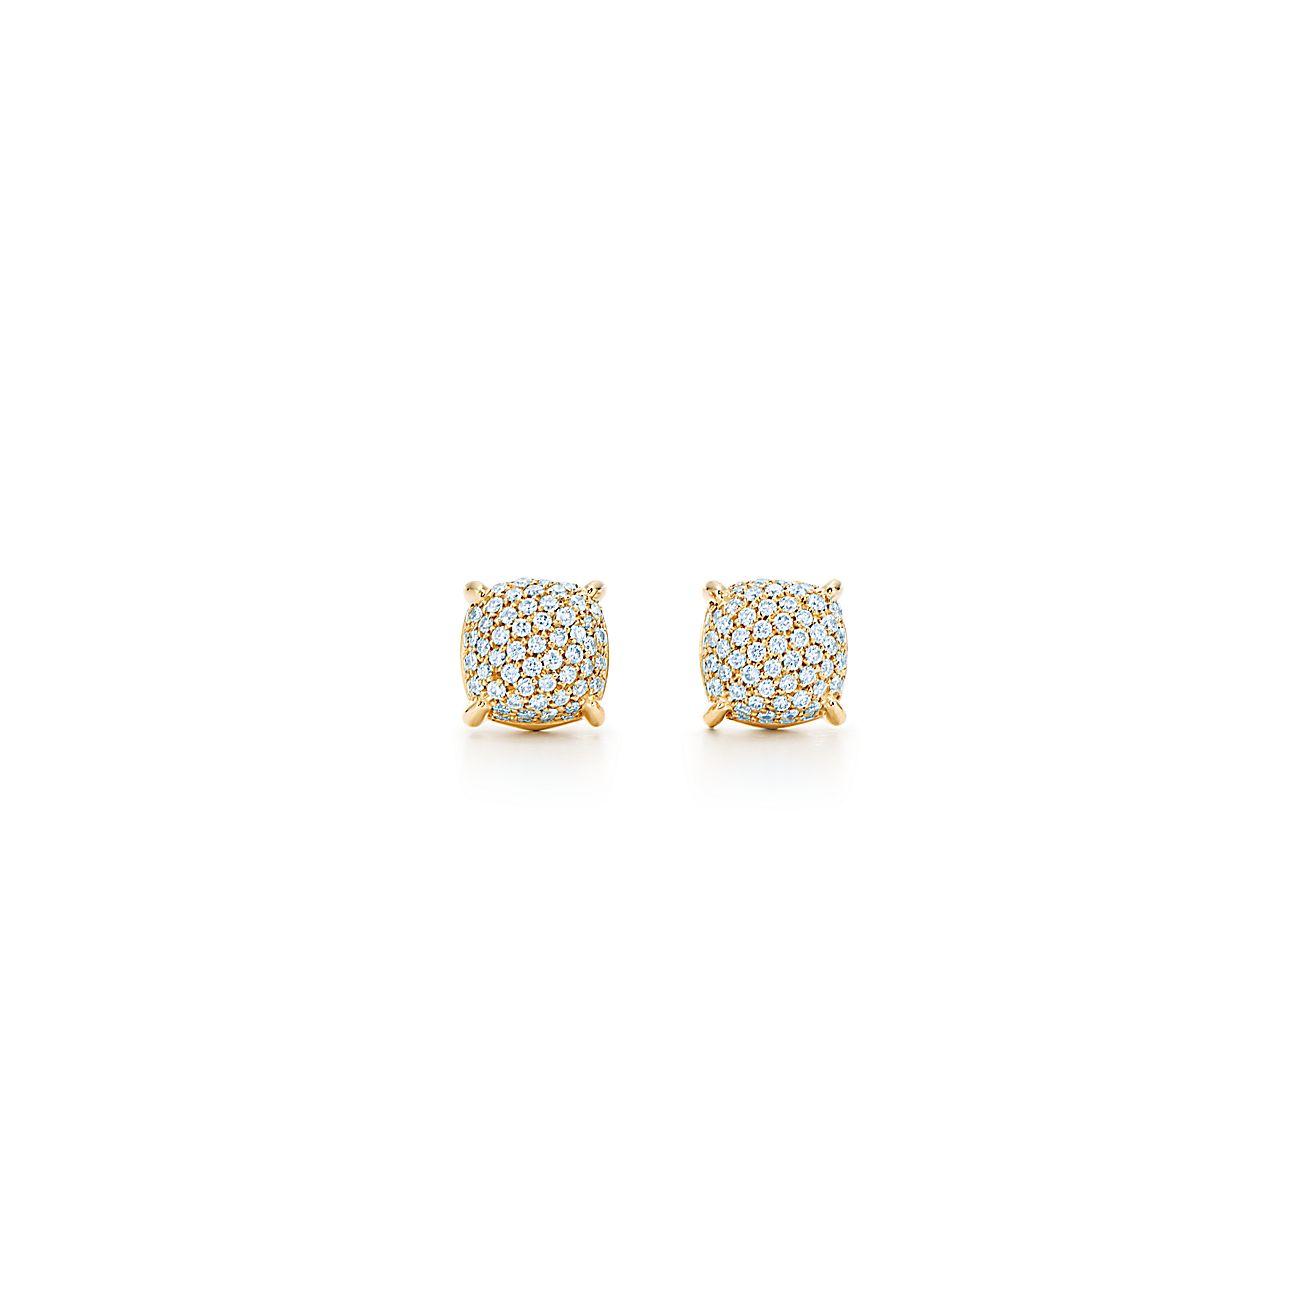 Paloma's Sugar Stacks:Earrings